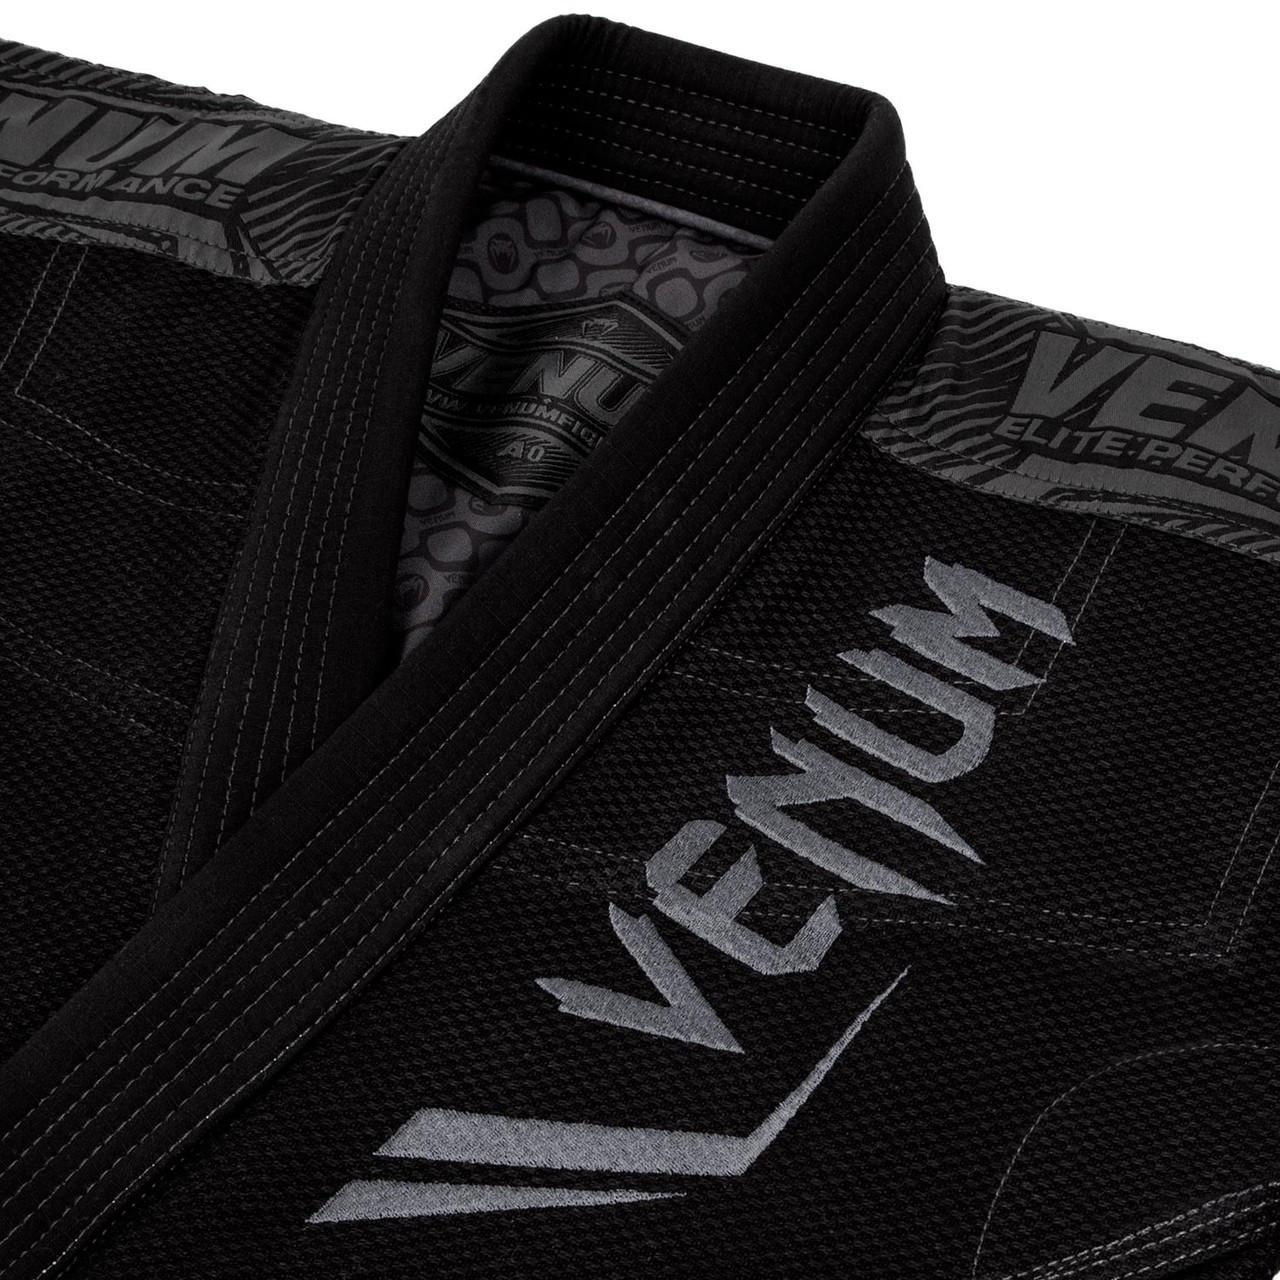 Zoomed into Venum logo Venum Elite BJJ GI in Black on black  is now available at www.thejiujitsushop.com  Enjoy Free Shipping from The Jiu Jitsu Shop today!